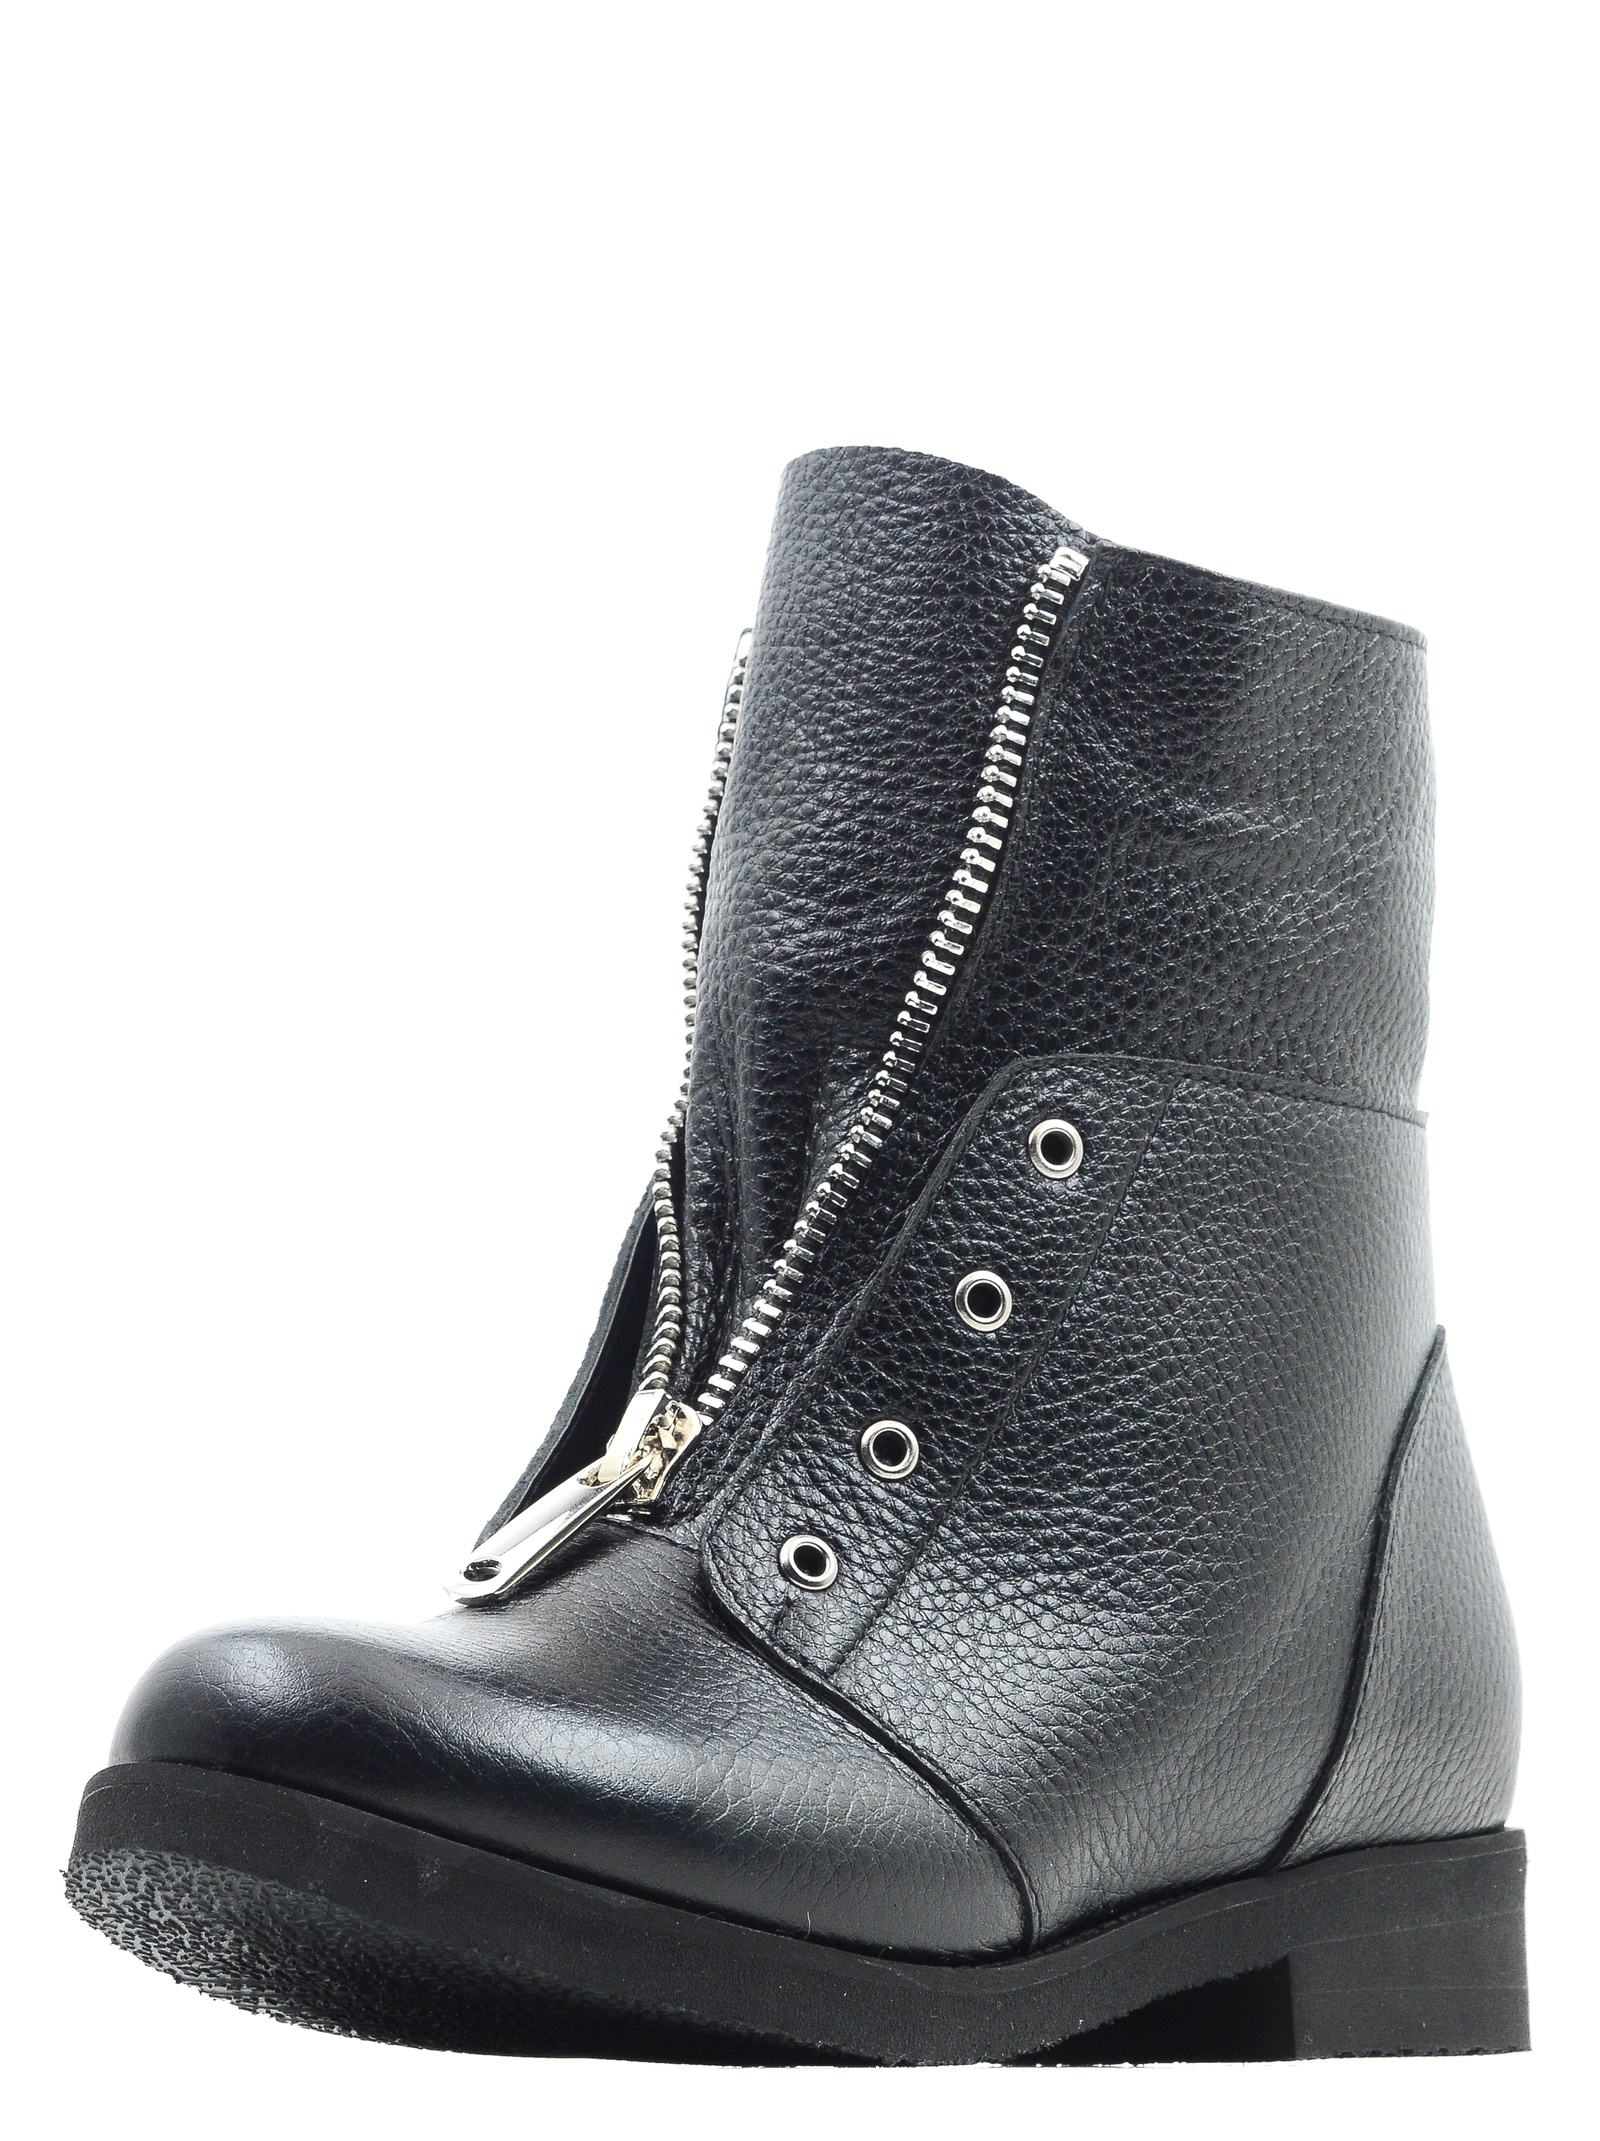 Ботинки ESTELLA ботинки estella